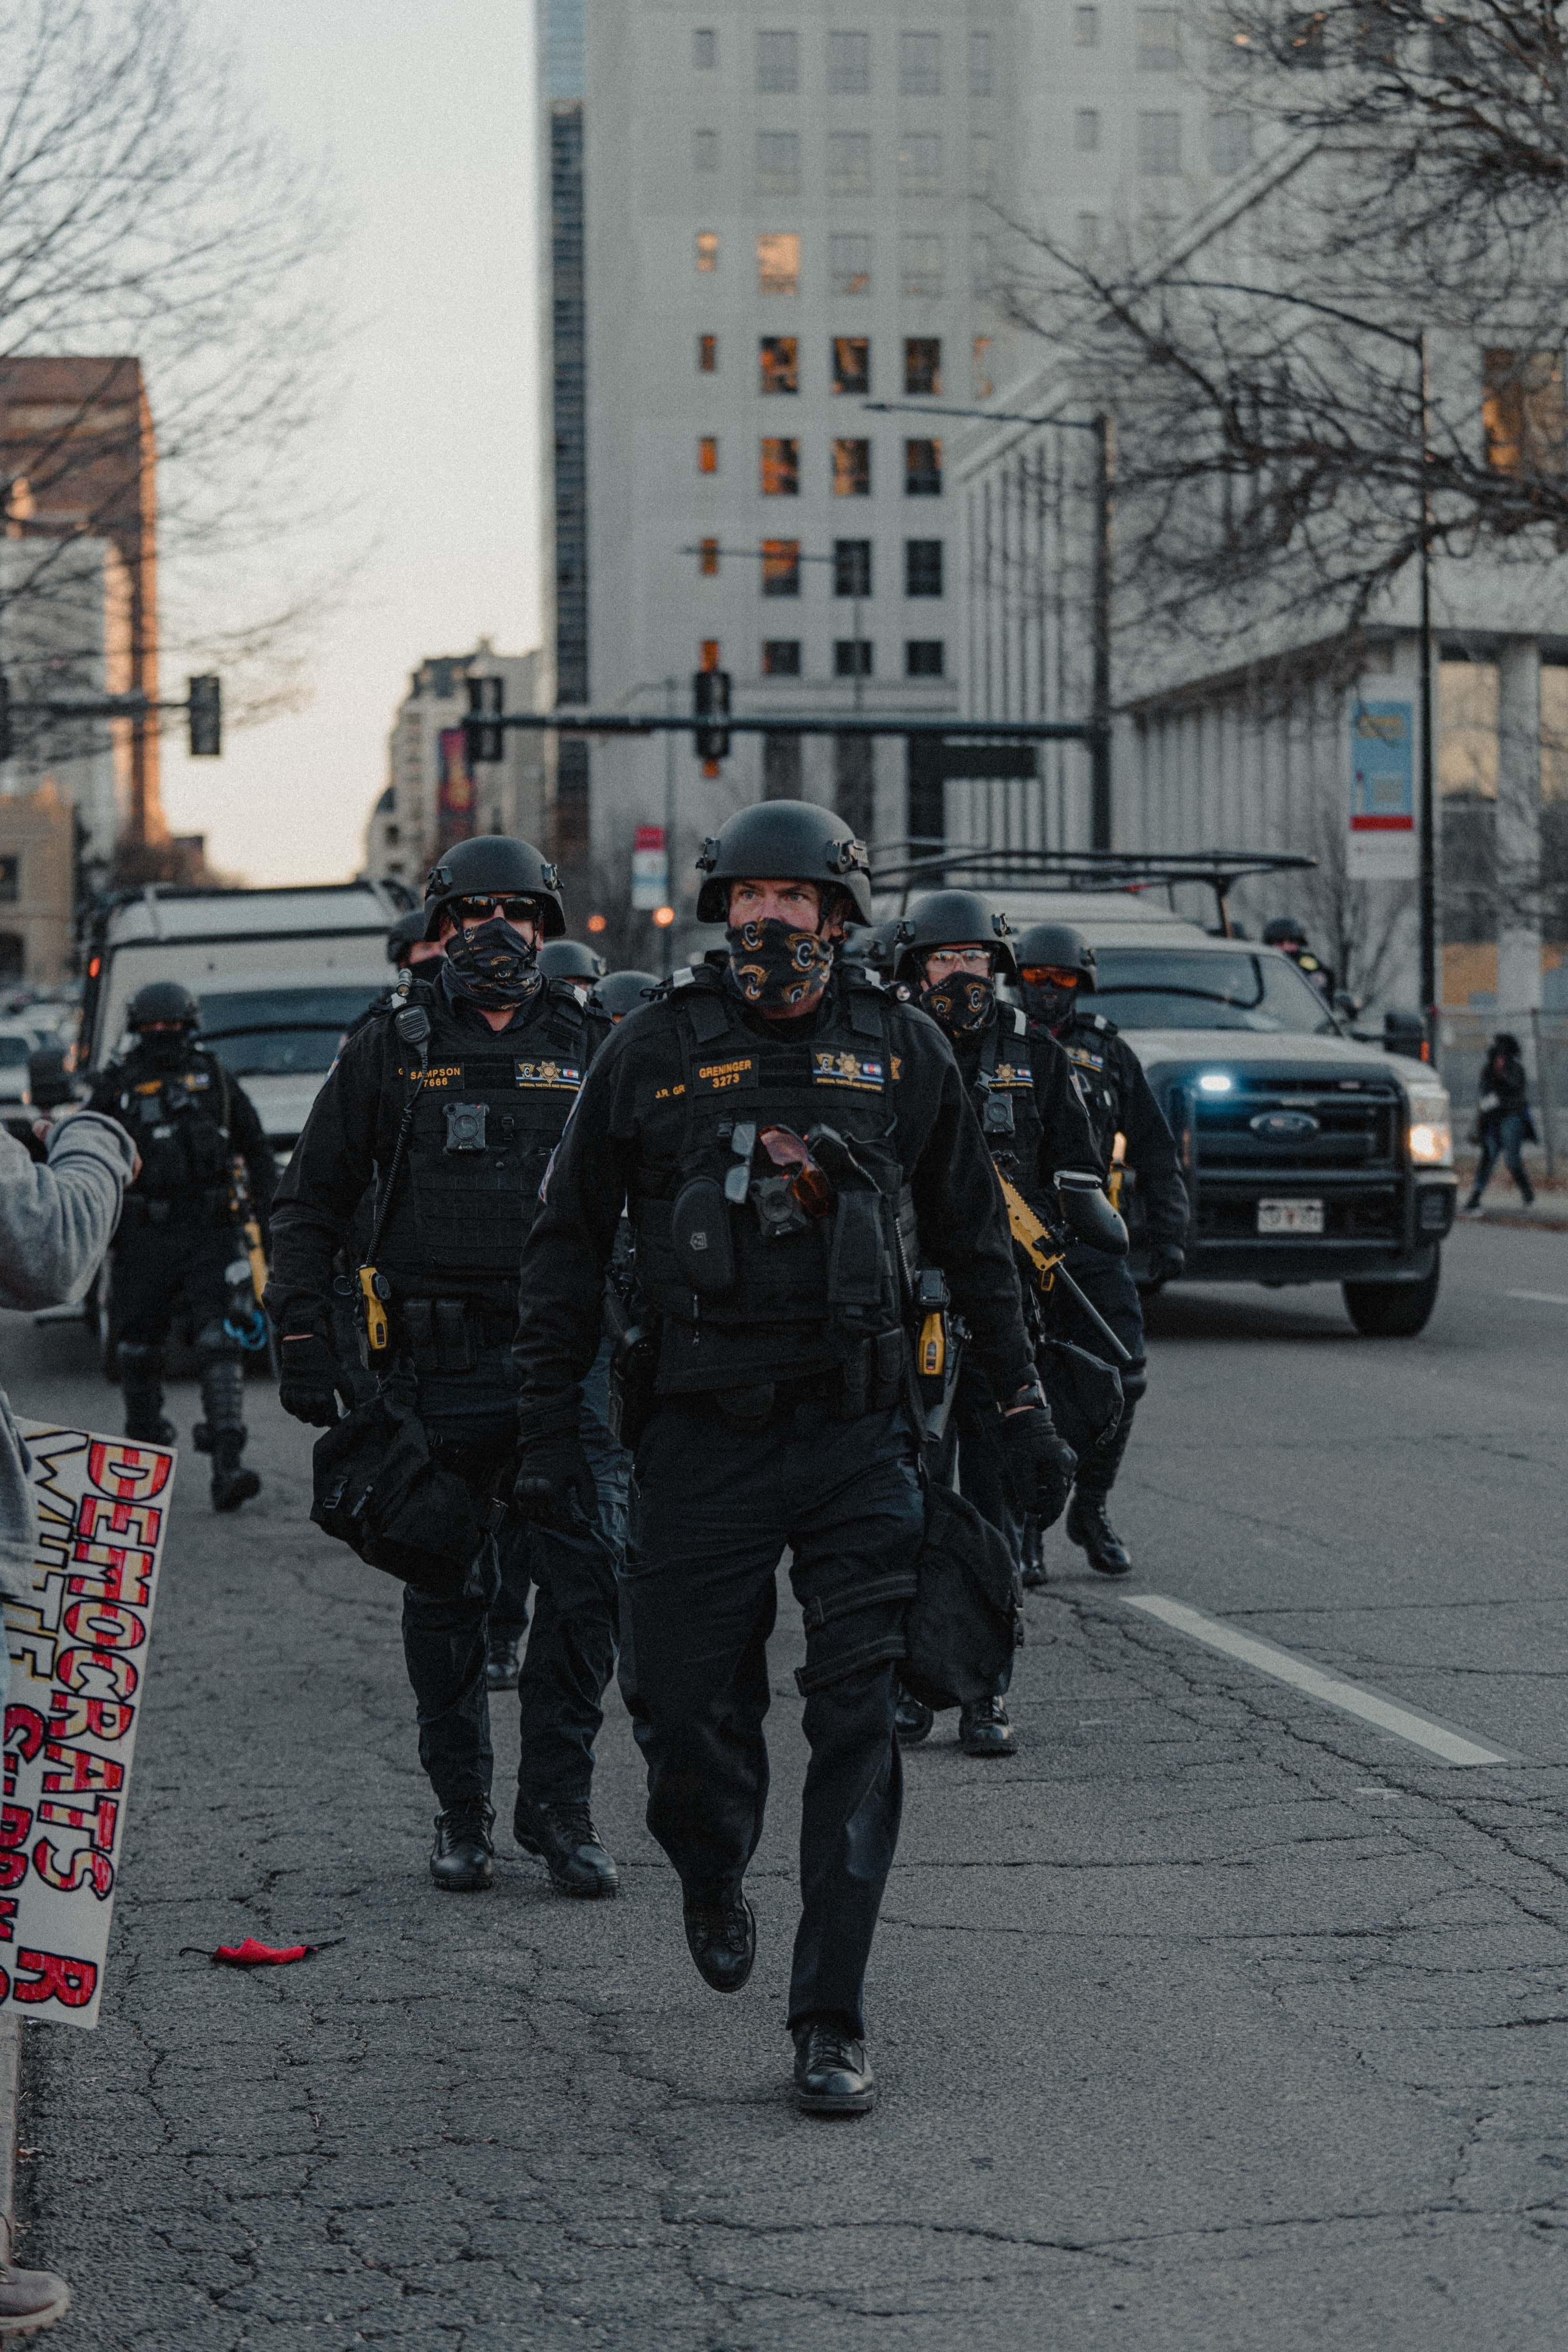 American-police-in-SWAT-gear